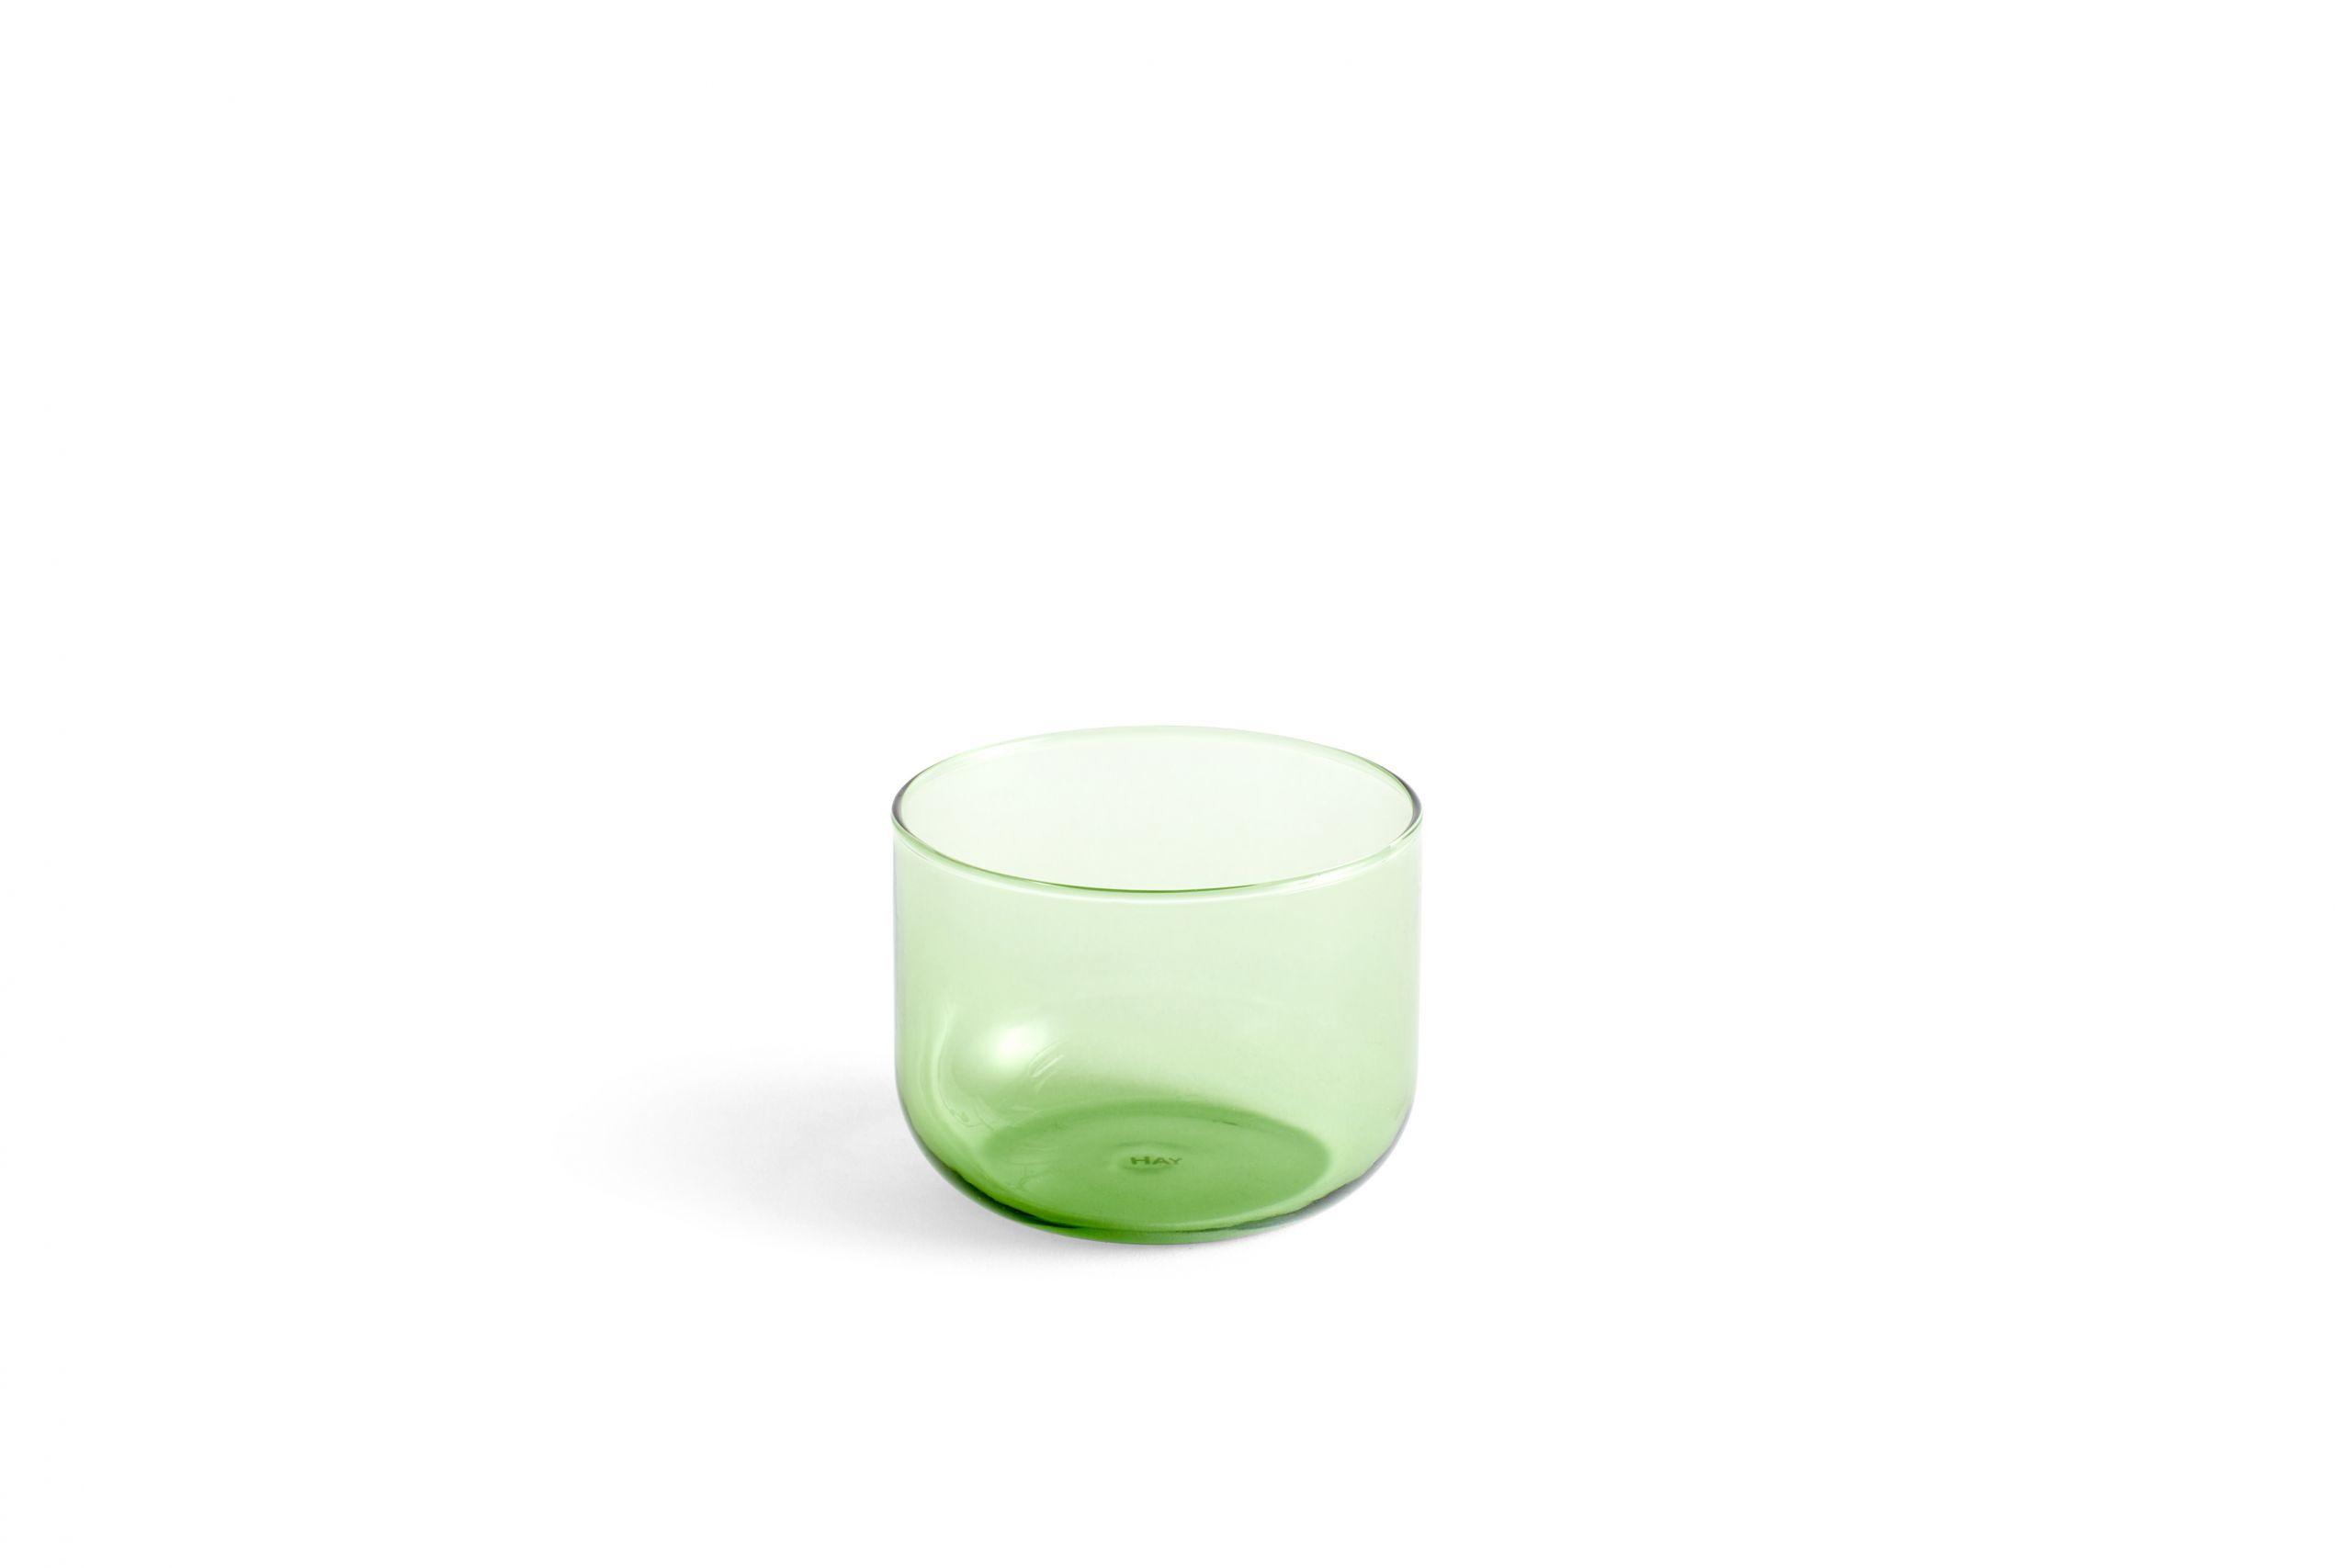 Tint Glass Green set of 2